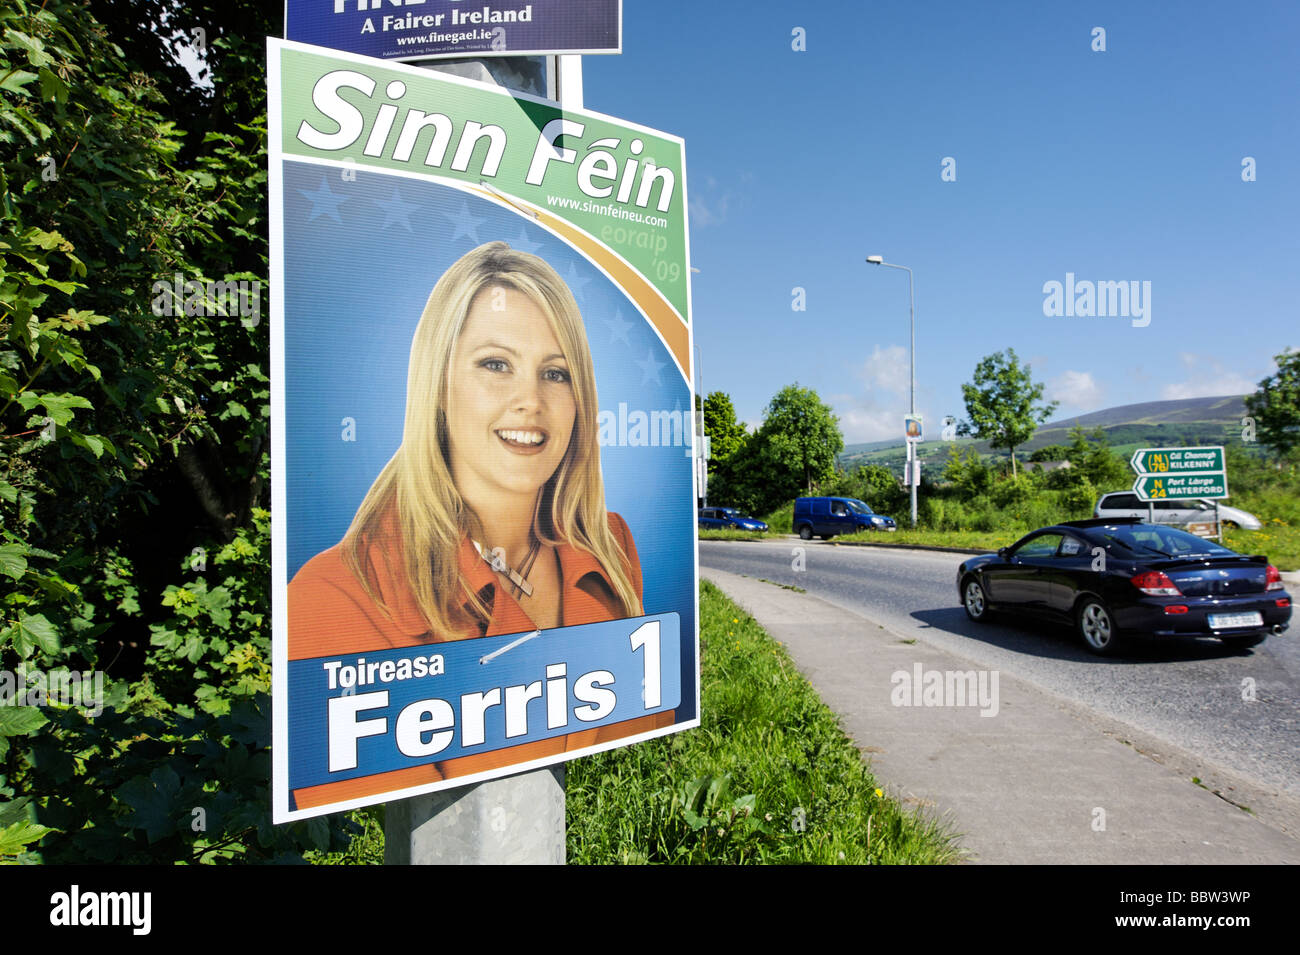 Sinn Féin lokale politische Partei Wahlplakat am Straßenrand in County Tipperary Irland 2009 Stockbild